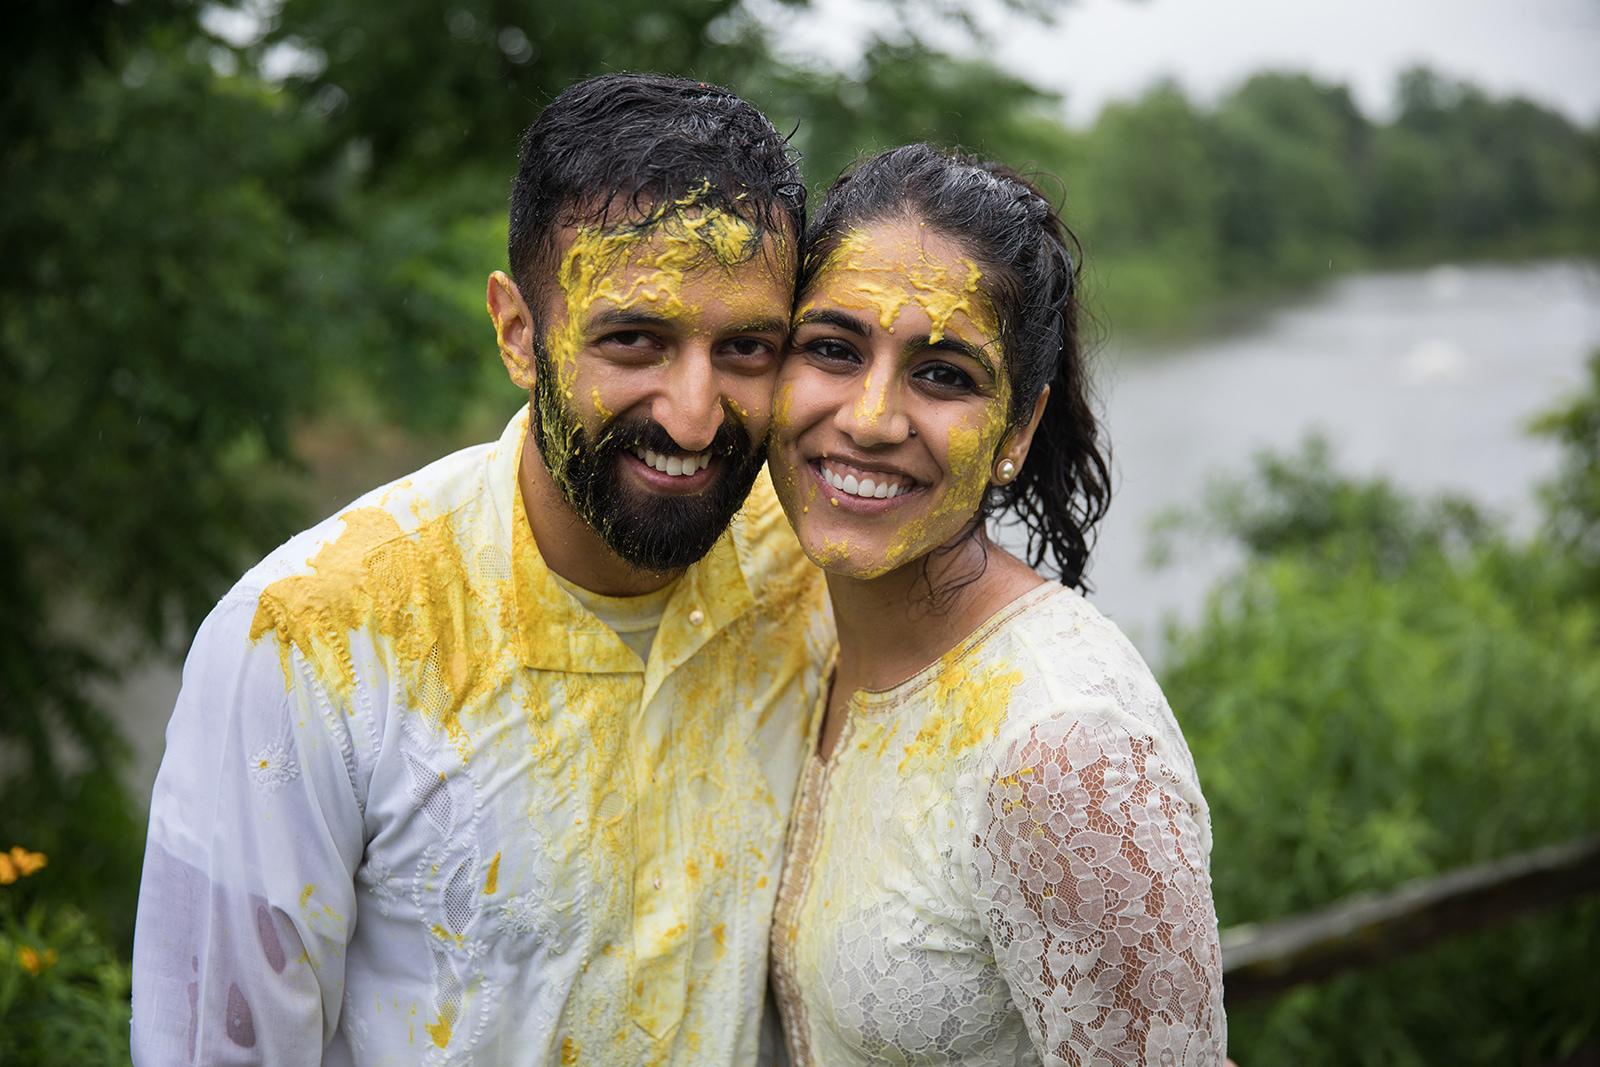 Le Cape Weddings - Sumeet and Chavi - Pithi-36-2.jpg